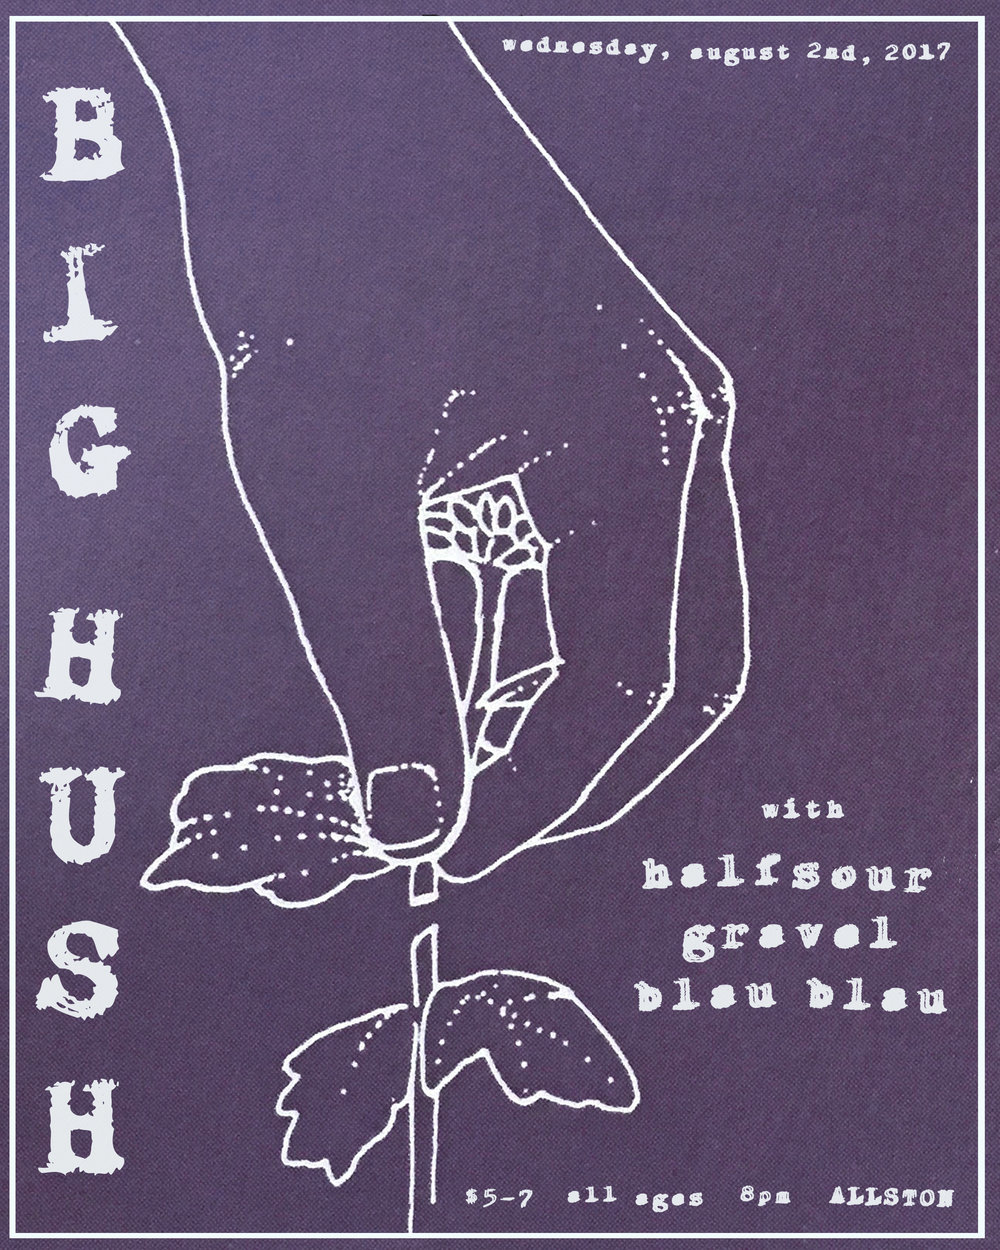 Flyer-BigHush82-Purple copy.jpg